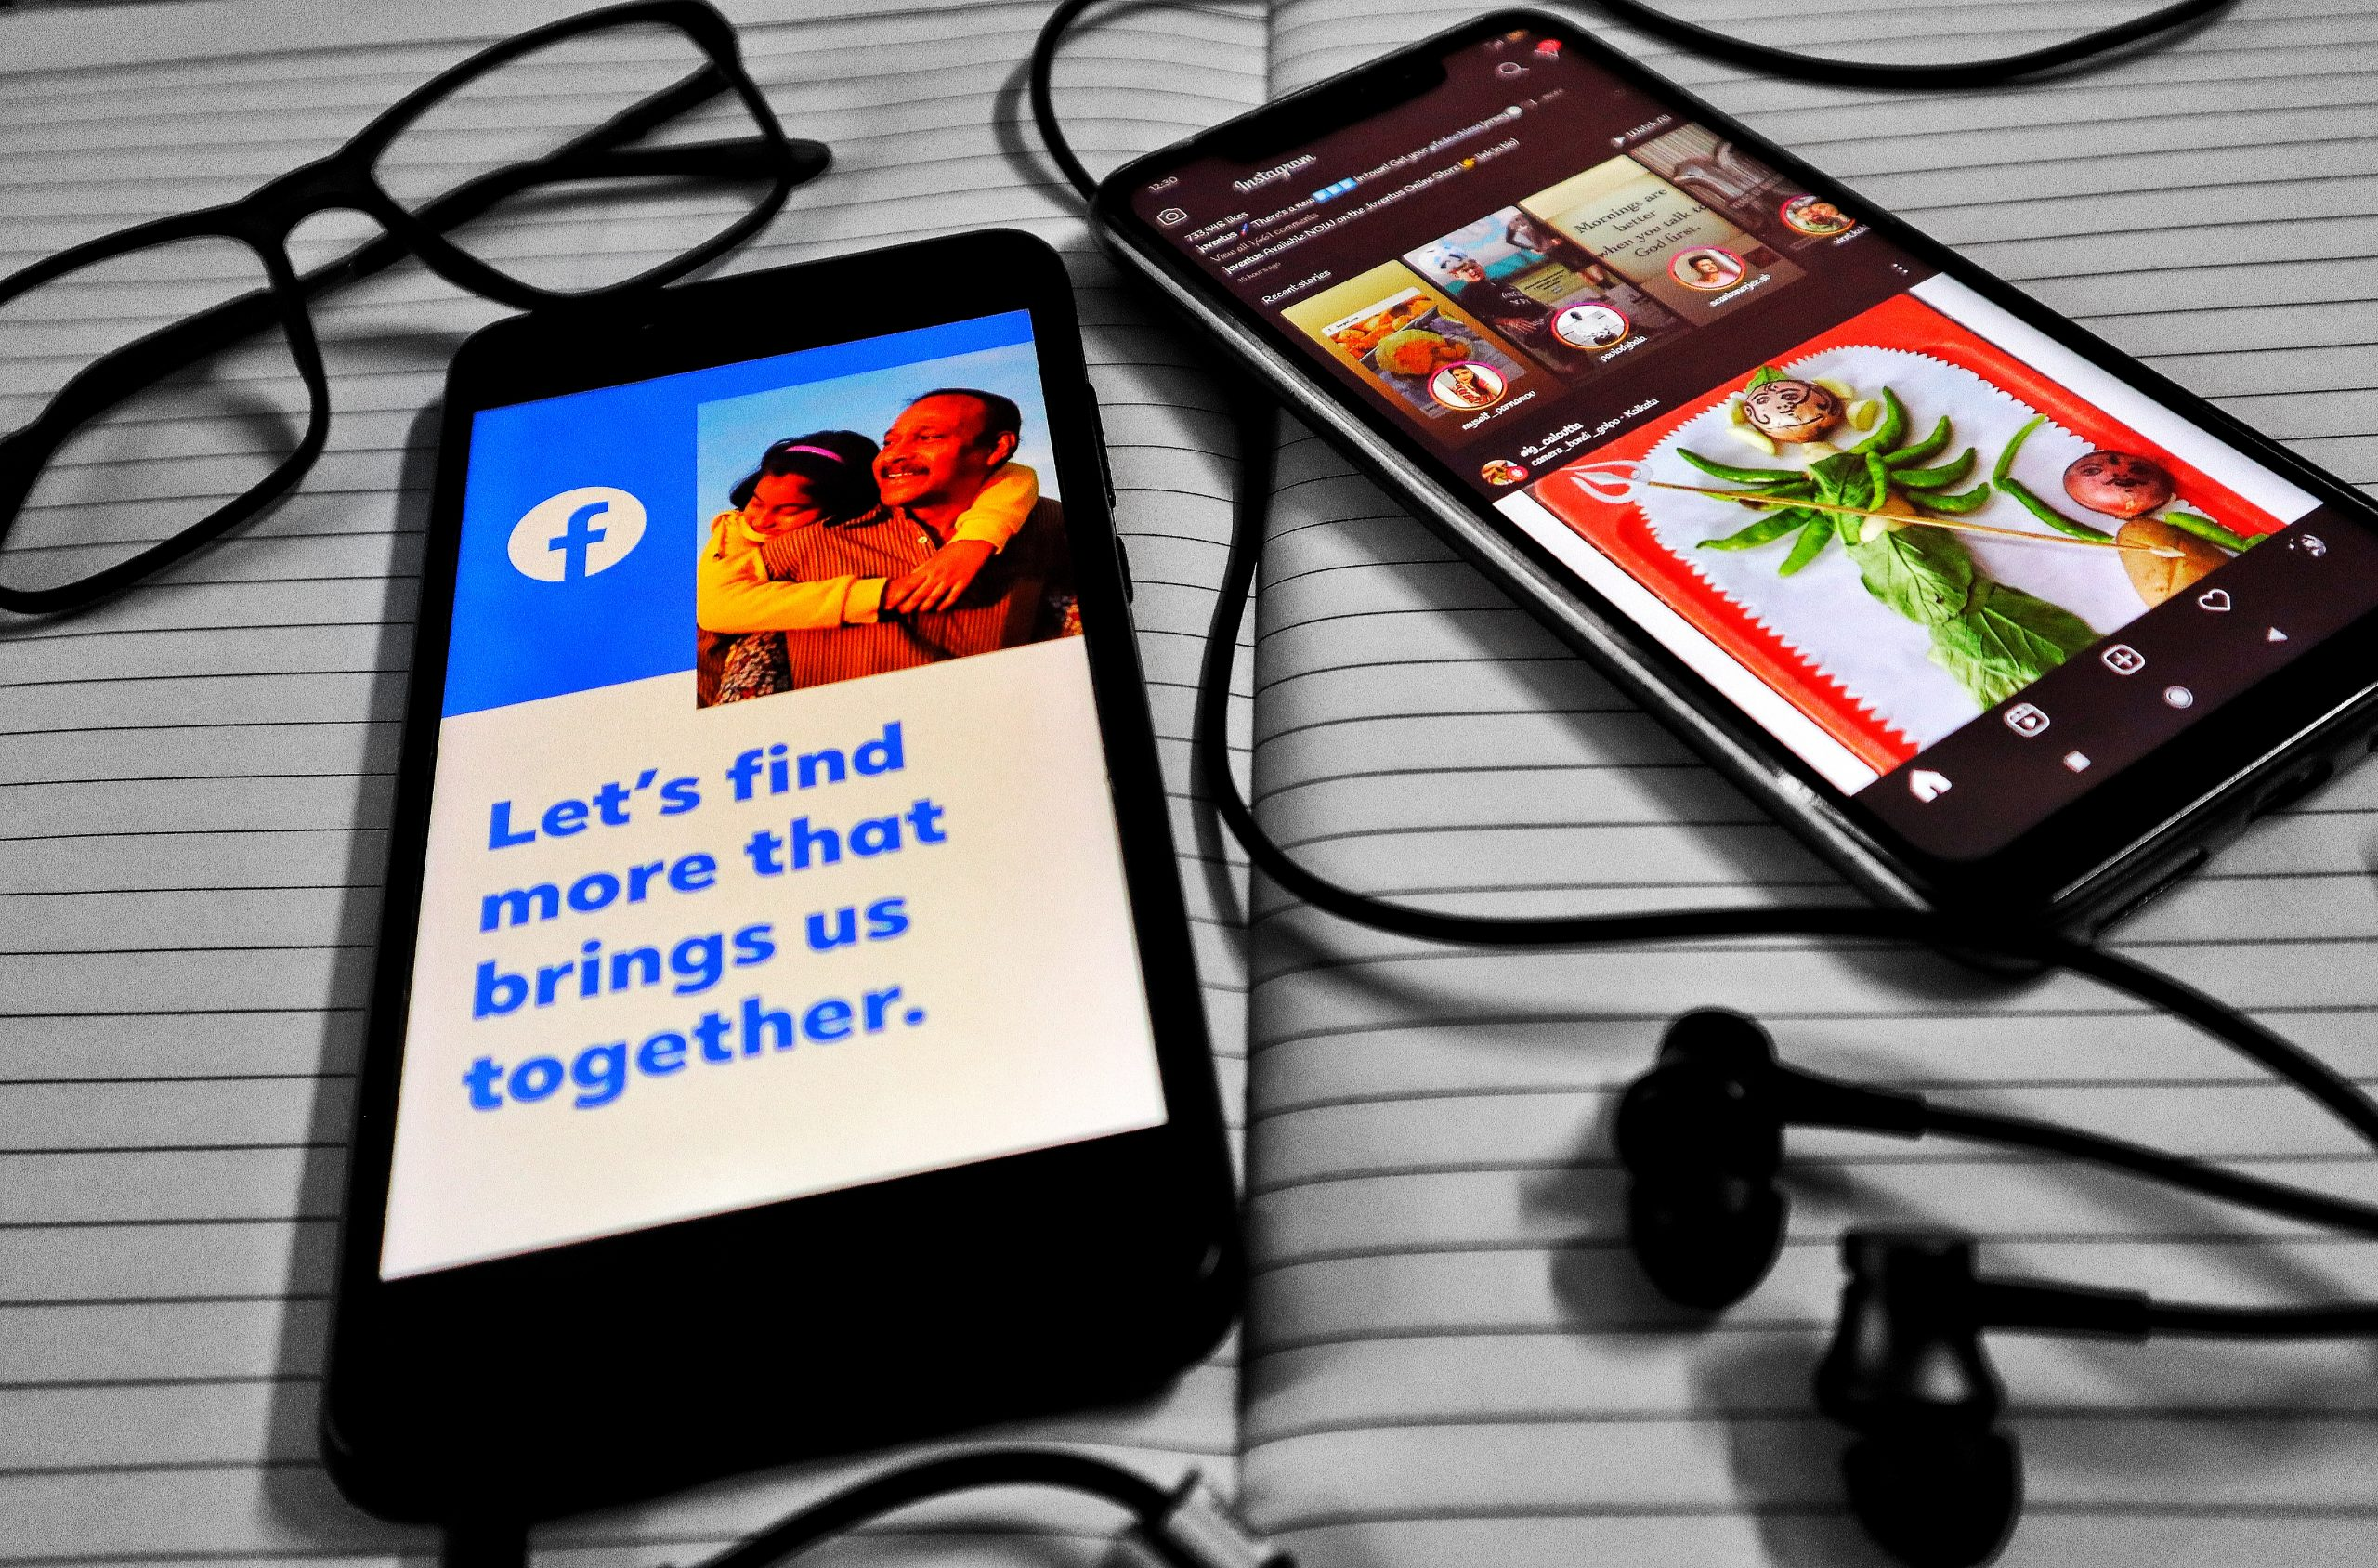 Social Media apps for time pass